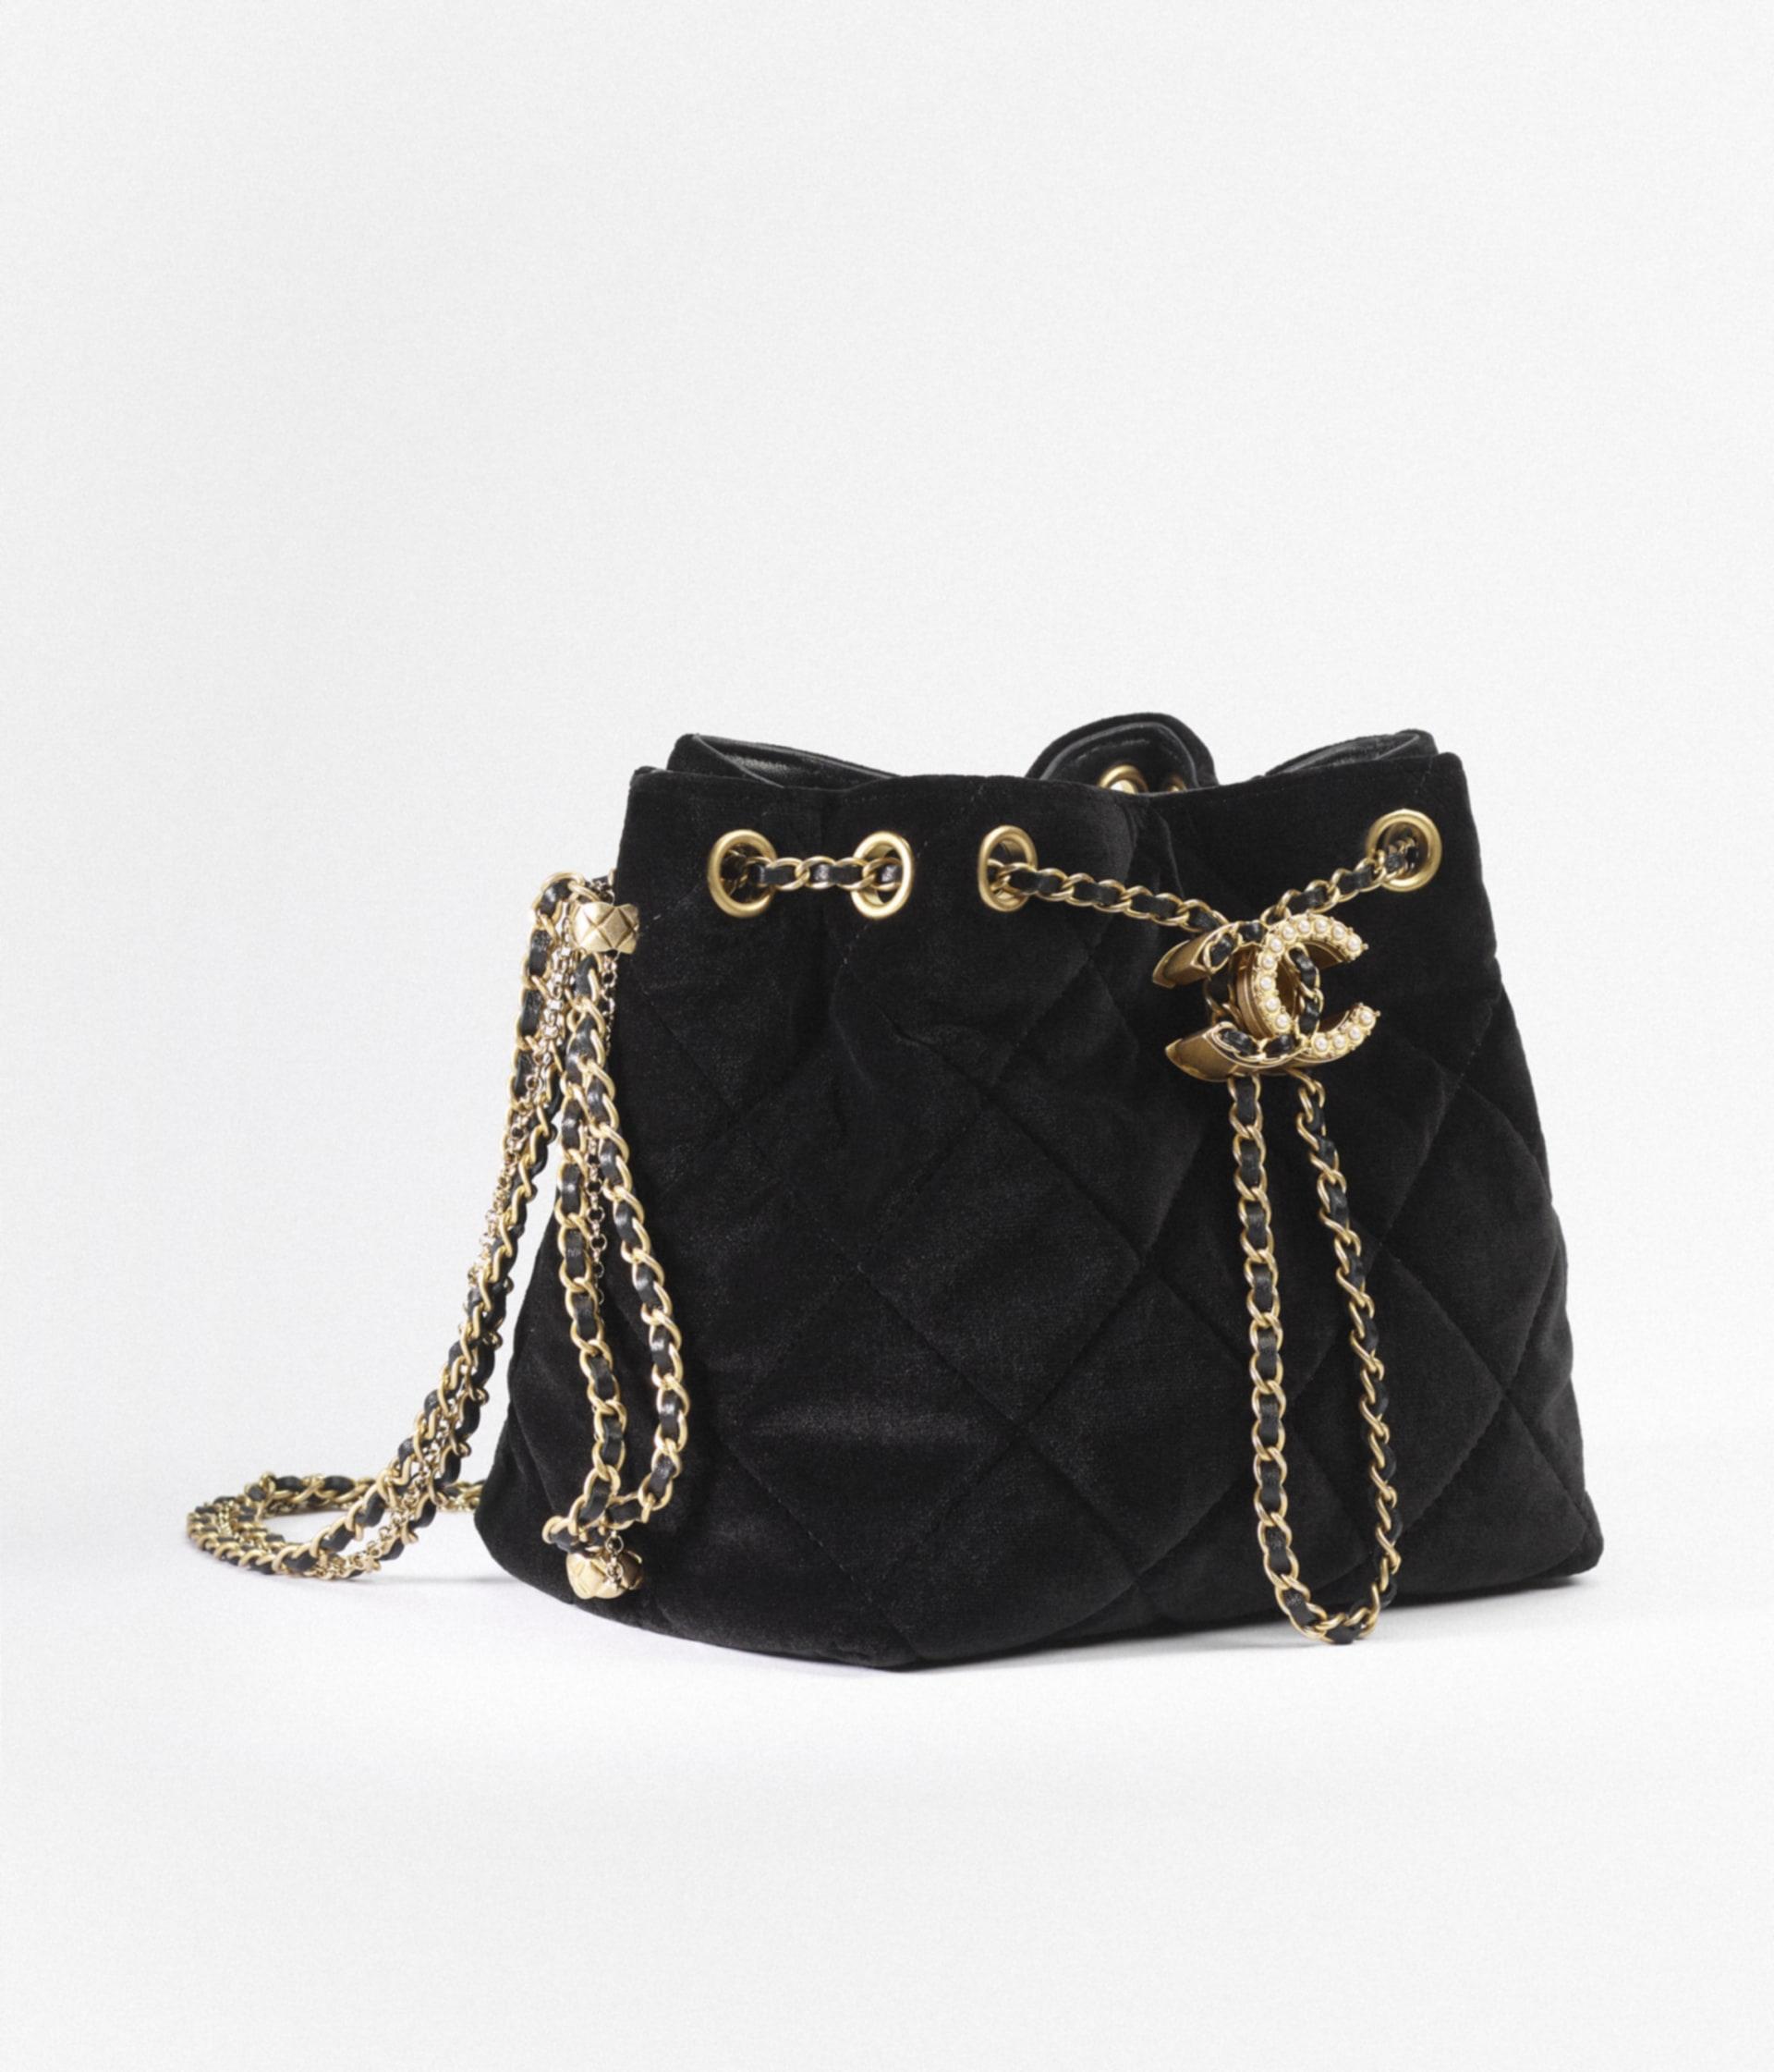 image 2 - Small Bucket Bag - Velvet & Gold-Tone Metal - Black